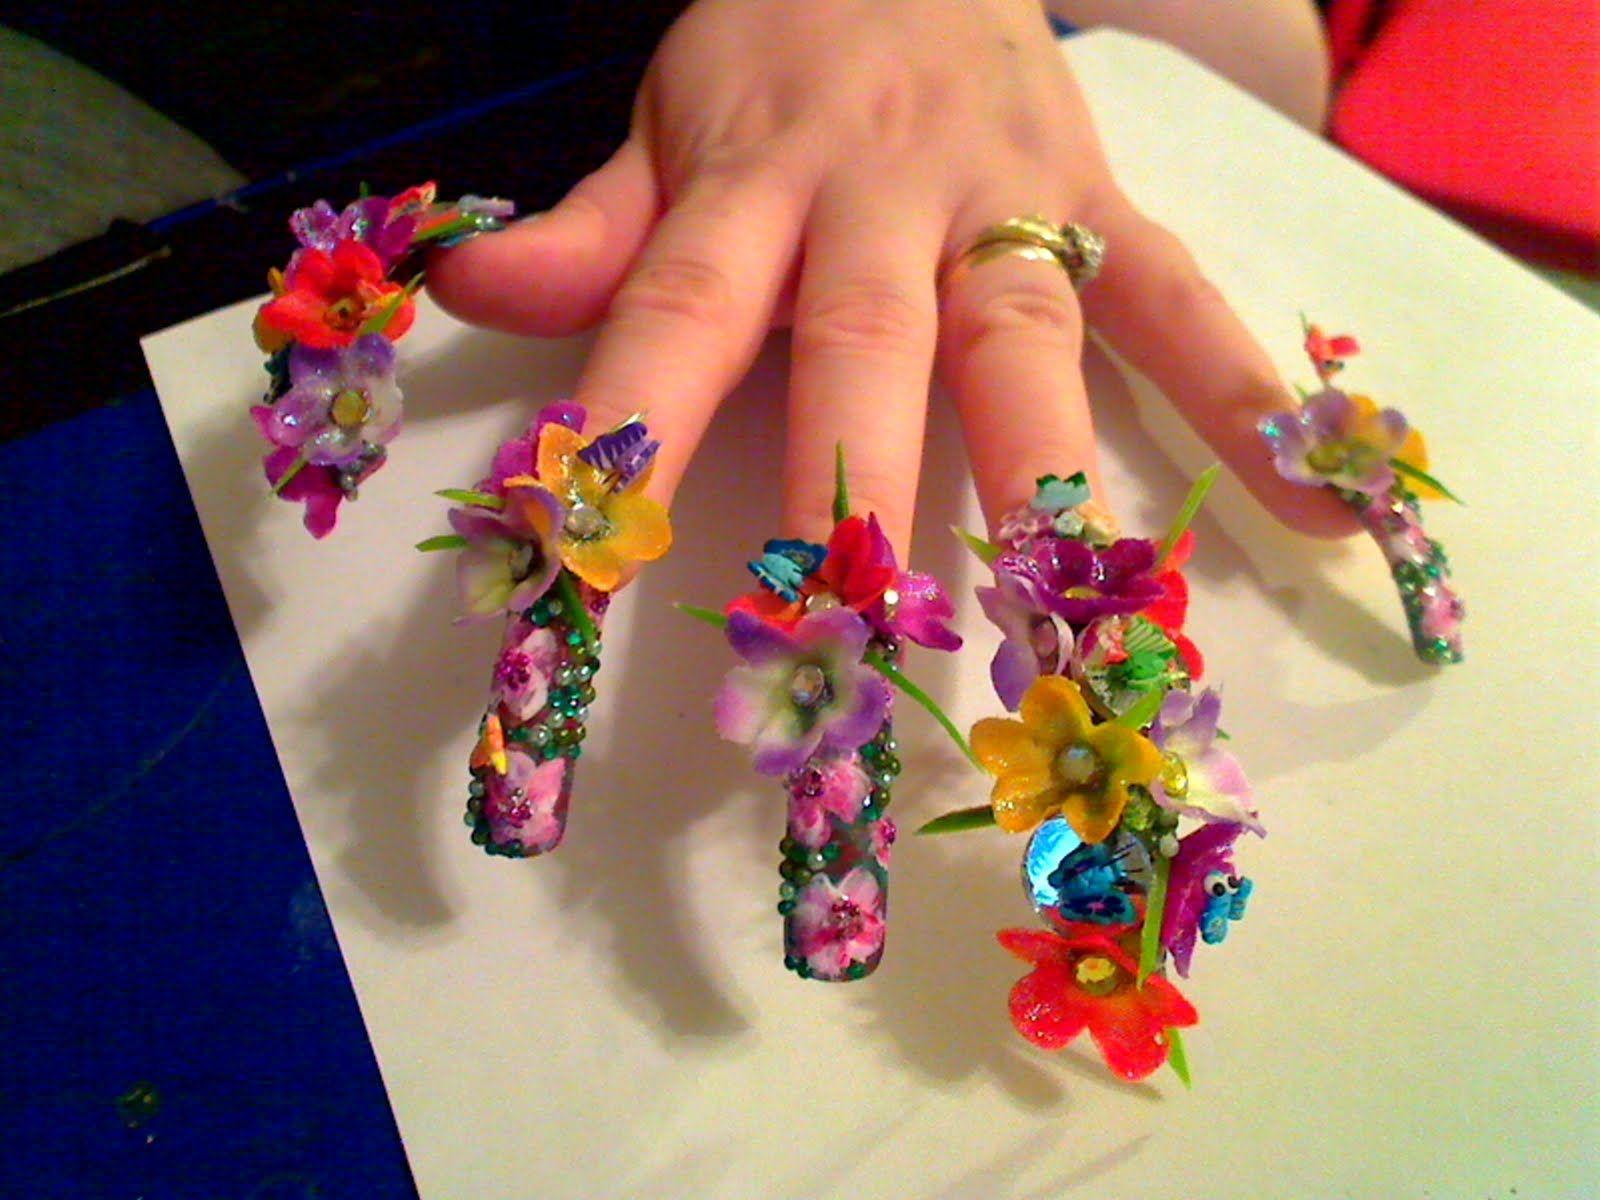 Pin By Ruth Maachdo On Makeup And Nails Pinterest Crazy Nails